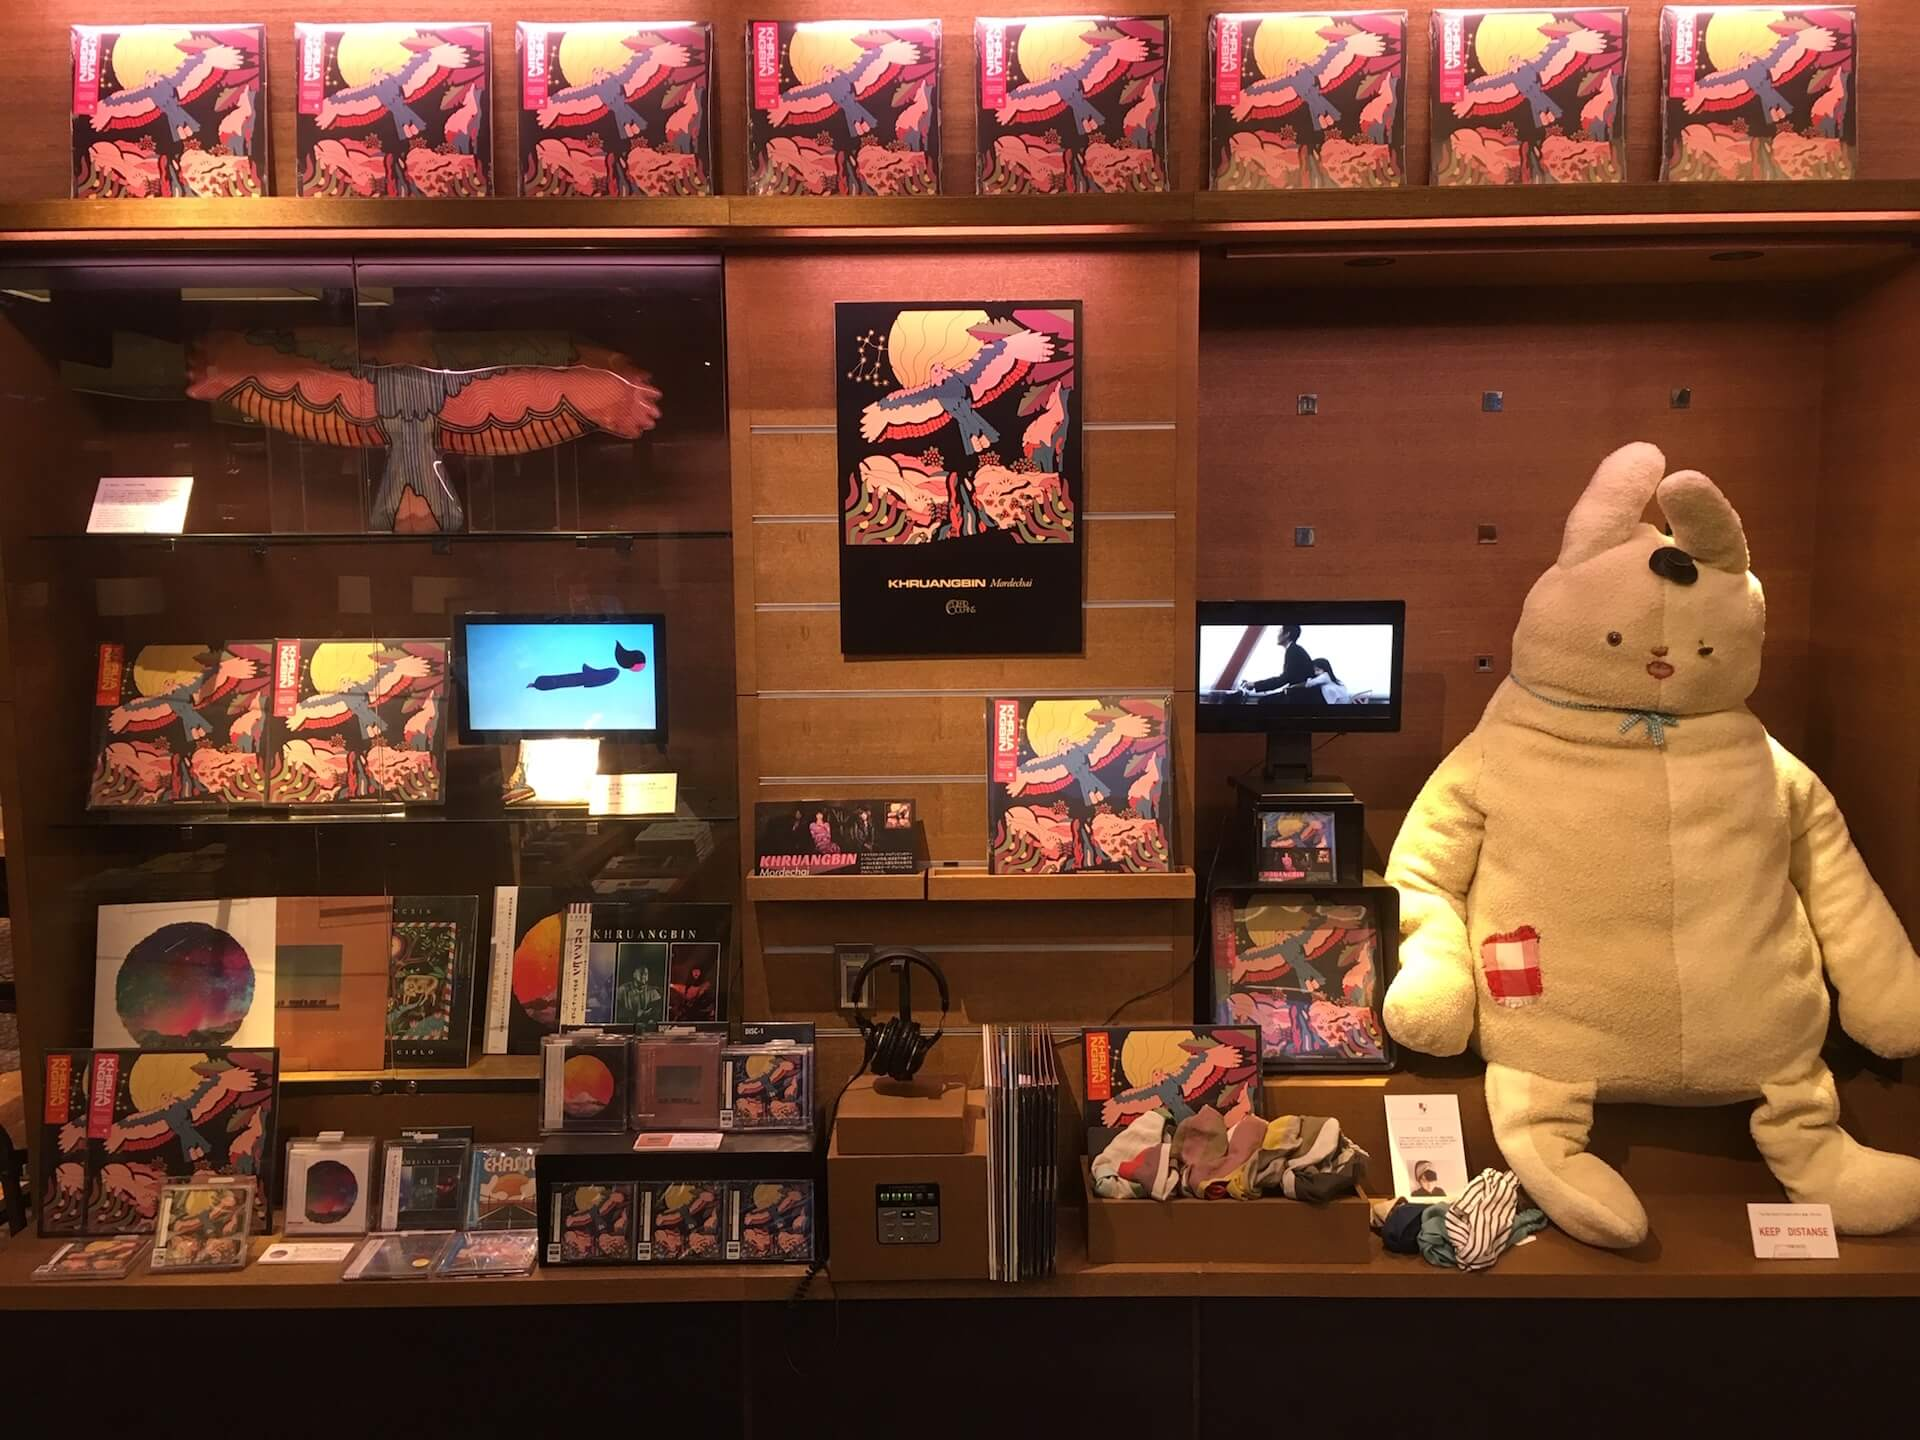 Khruangbinのニューアルバム『MORDECHAI』リリース記念フェアが代官山蔦屋書店にて開催!MVに登場する巨大ぬぐるみ展示も art200629_khruangbin_tsutayadaikanyama_4